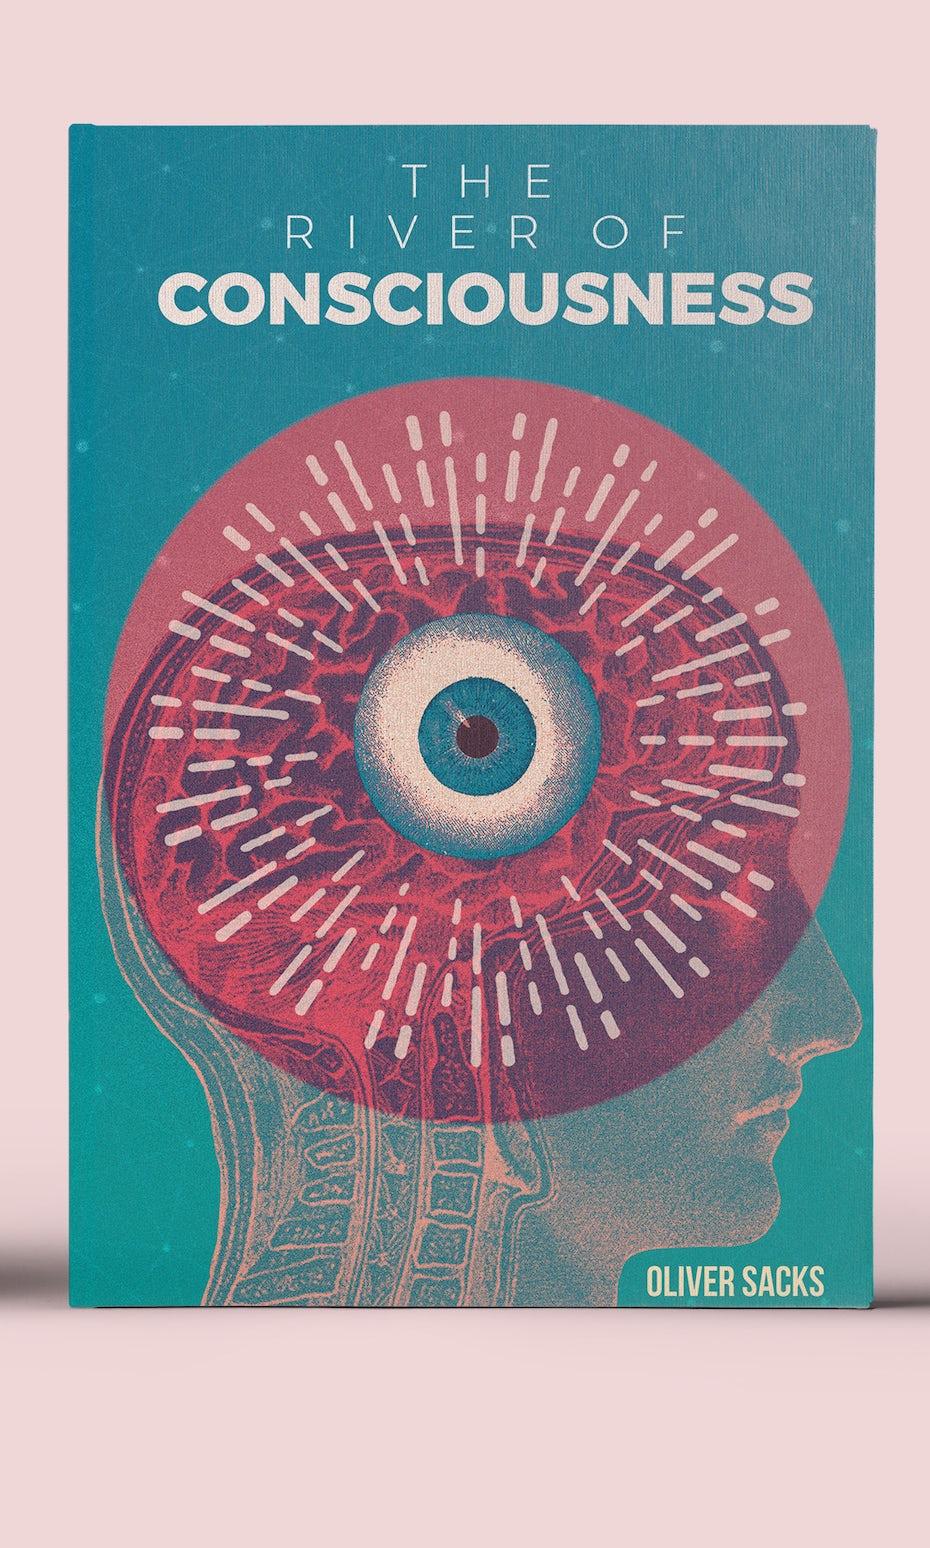 The River of Consciousness Cover Redesigned